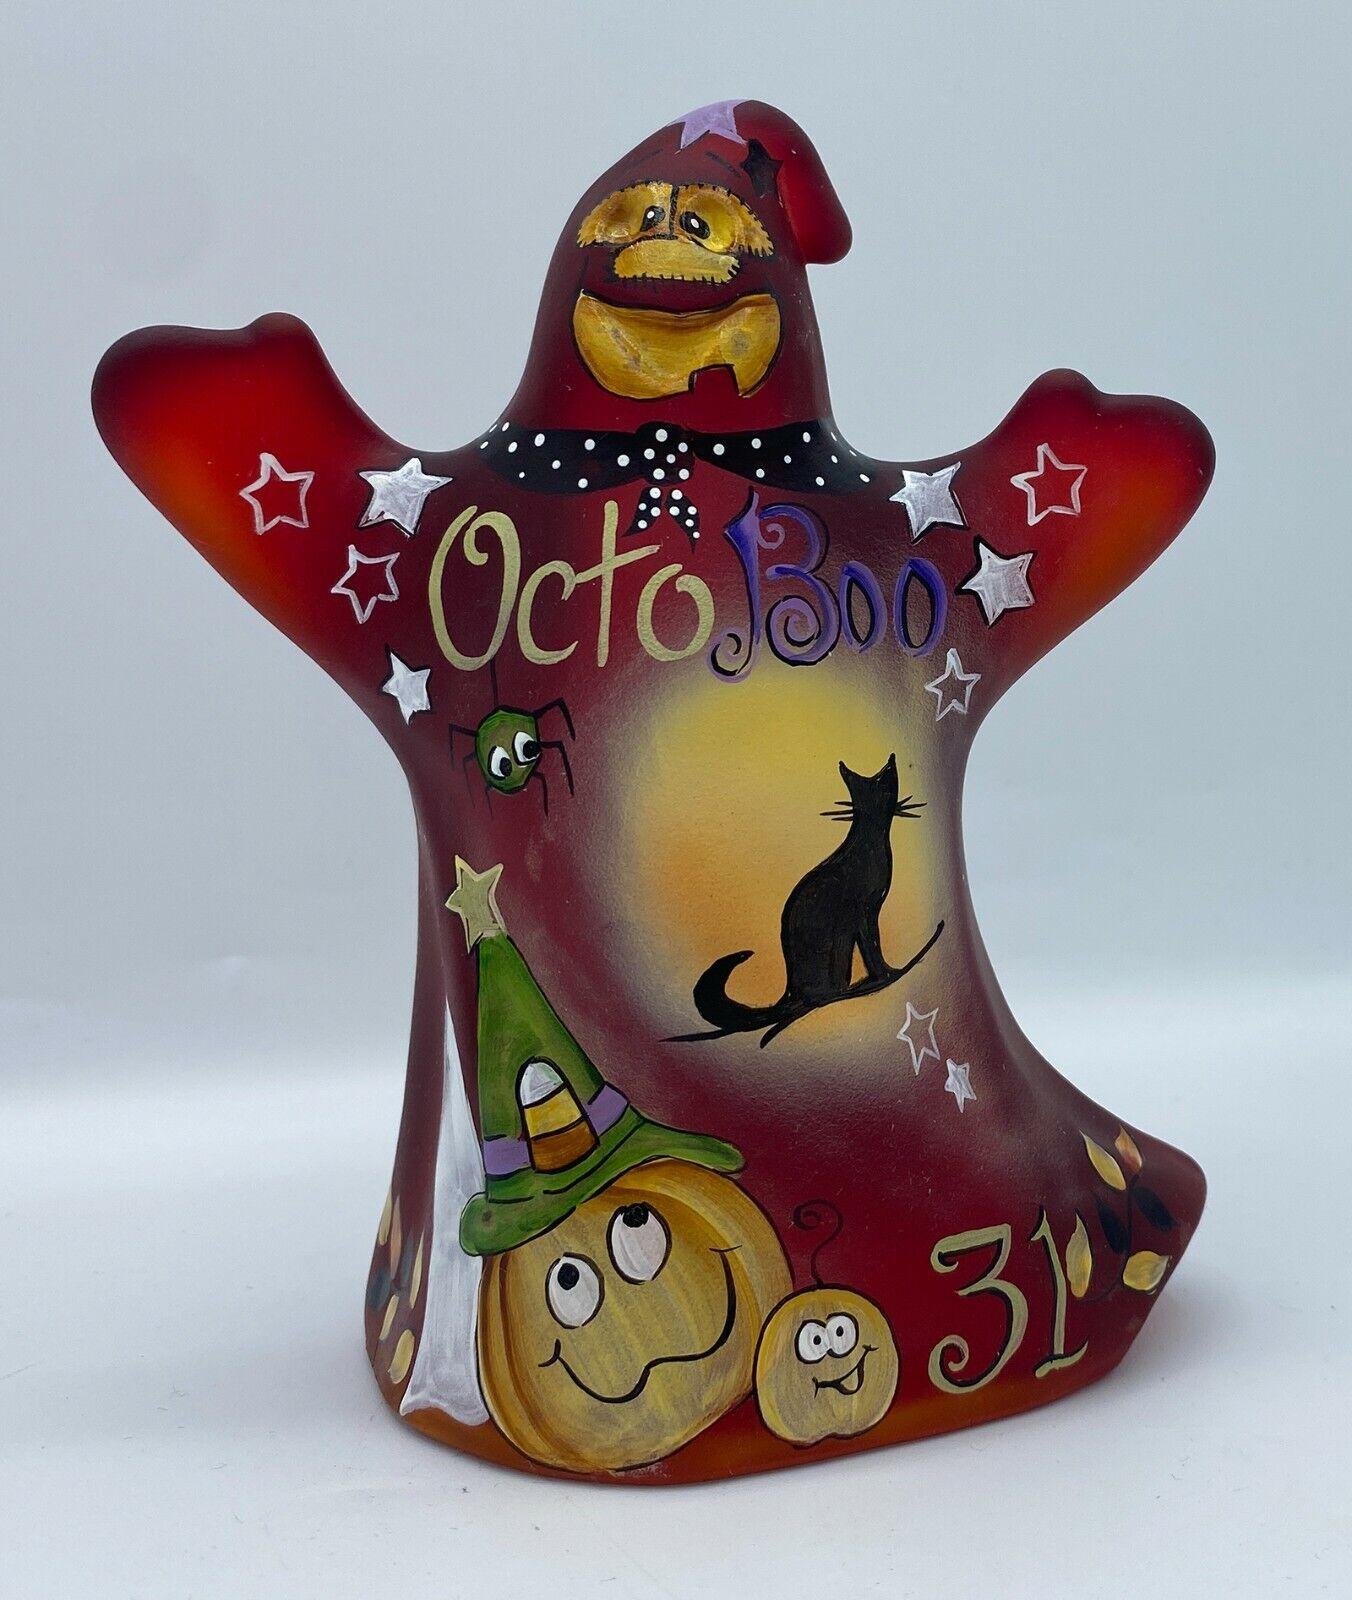 Fenton Art Glass OOAK Painted Ruby Glass OctoBoo Ghost Figurine By Kim Barley - $170.50